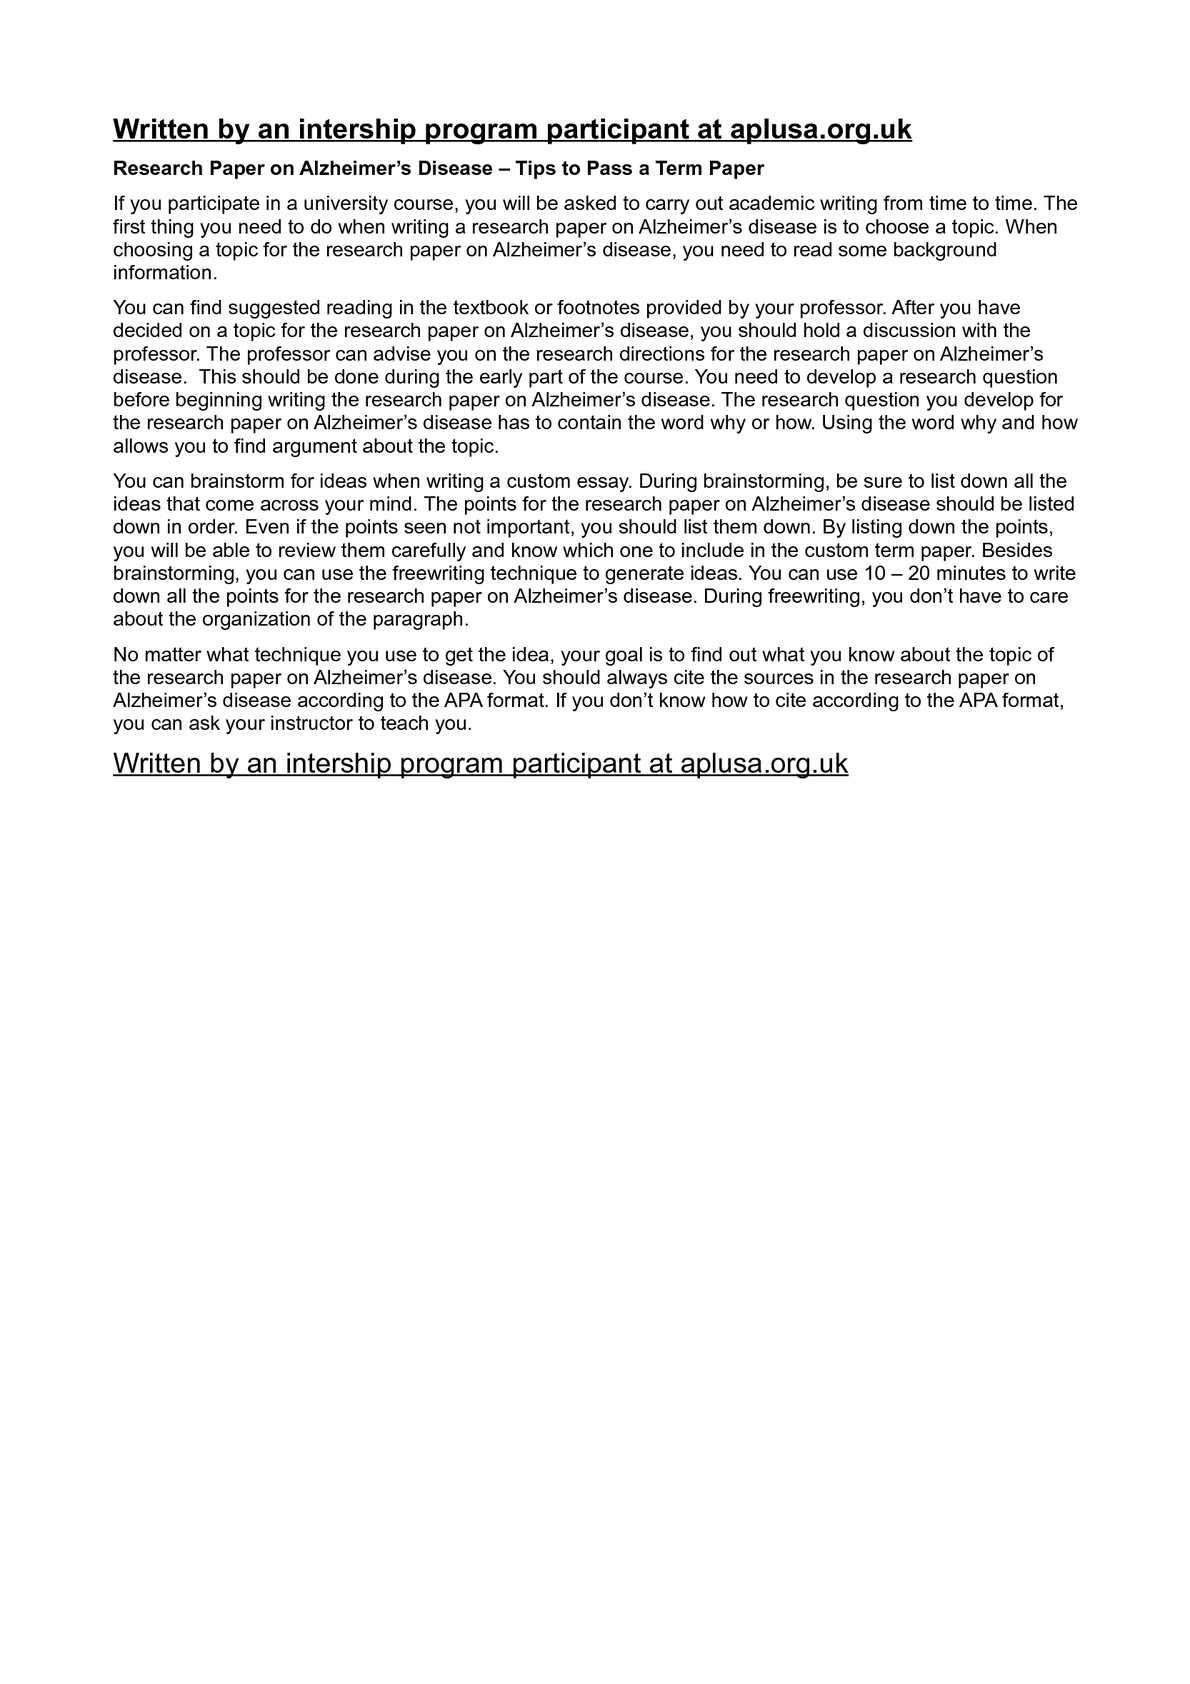 Essay on Organ Donation